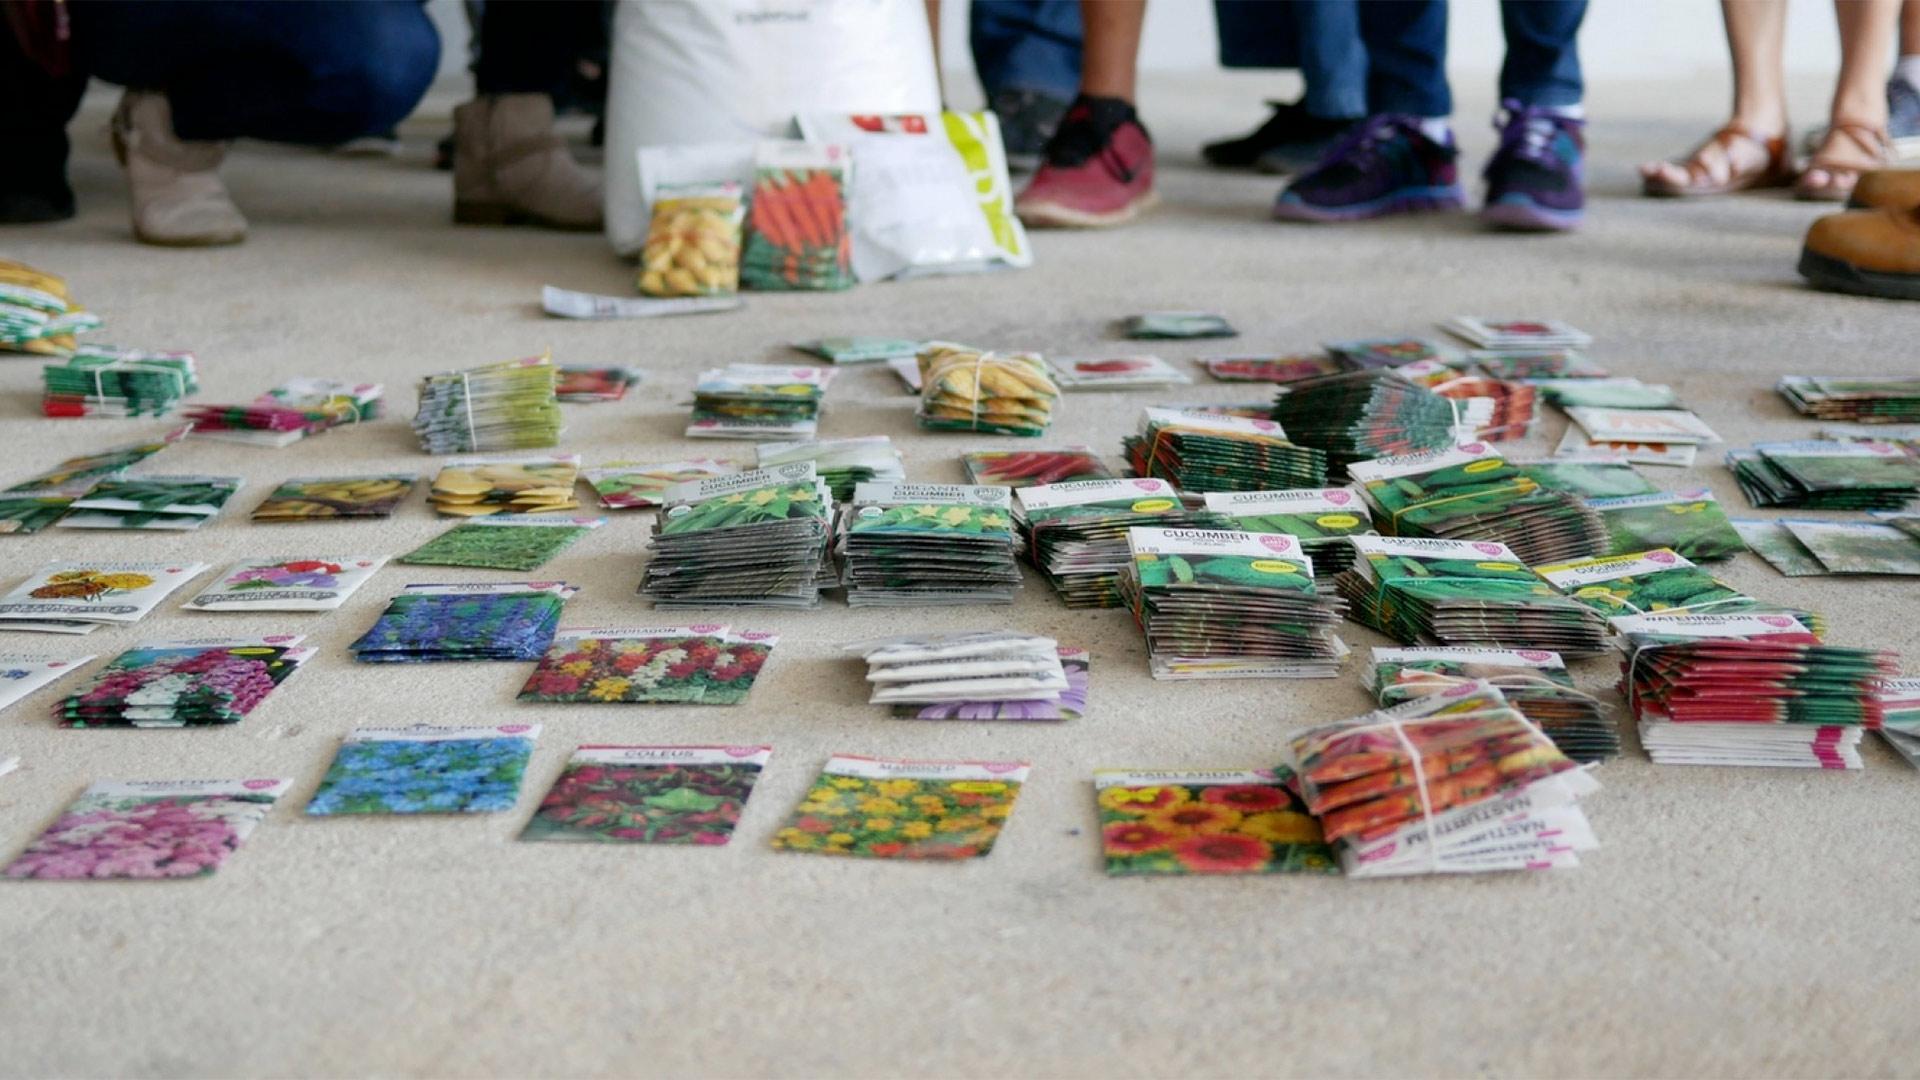 6plus spendid table seeds puerto rio